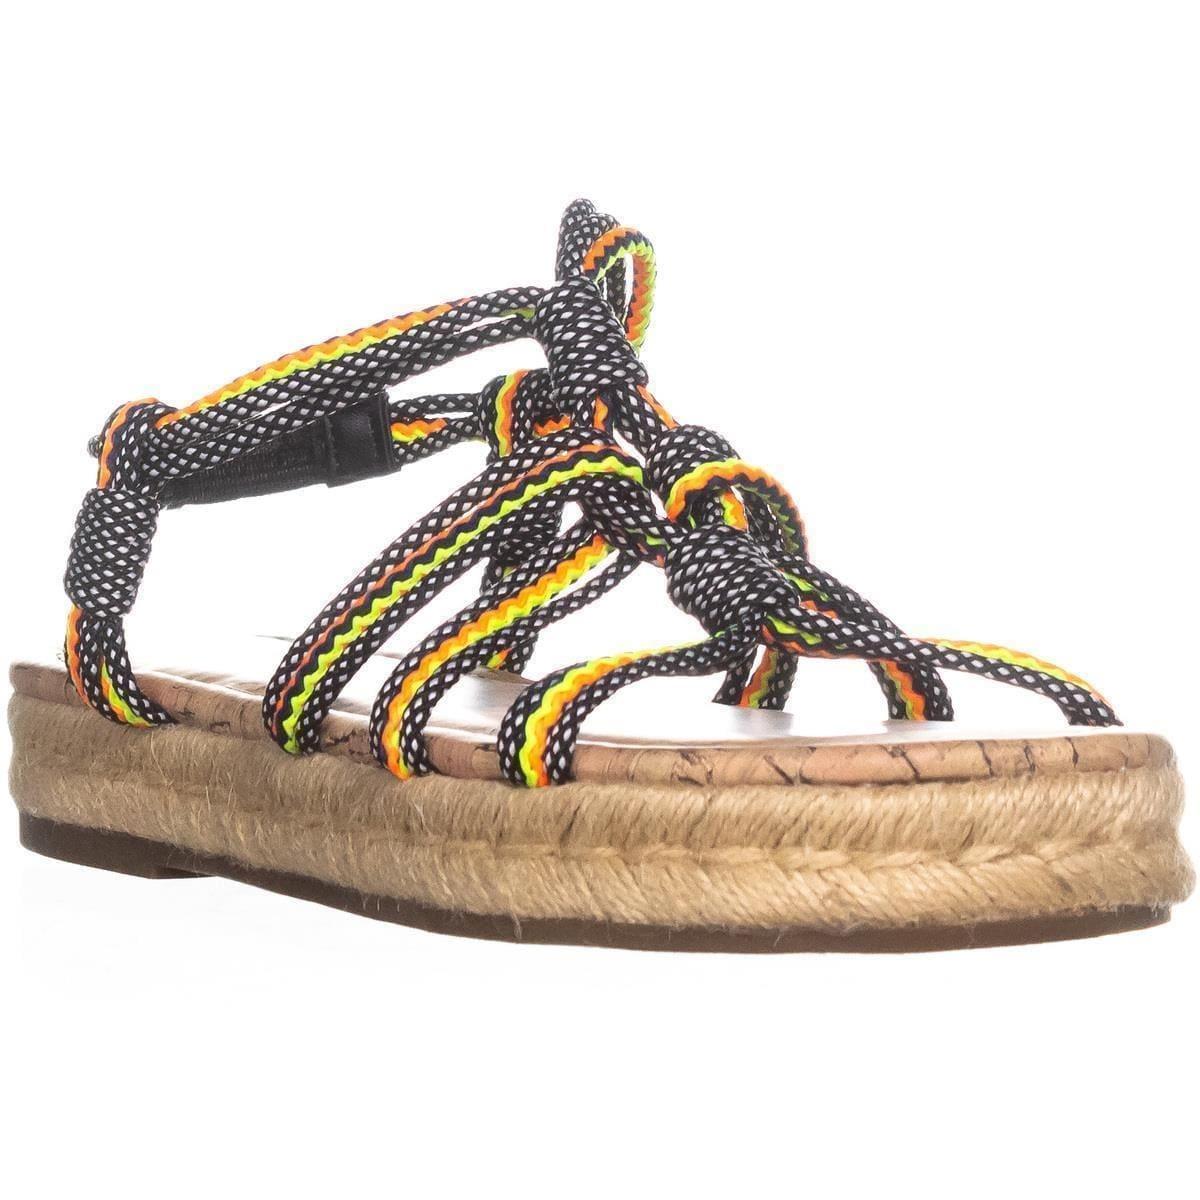 1acf2ba30 Low Heel Sam Edelman Women s Shoes